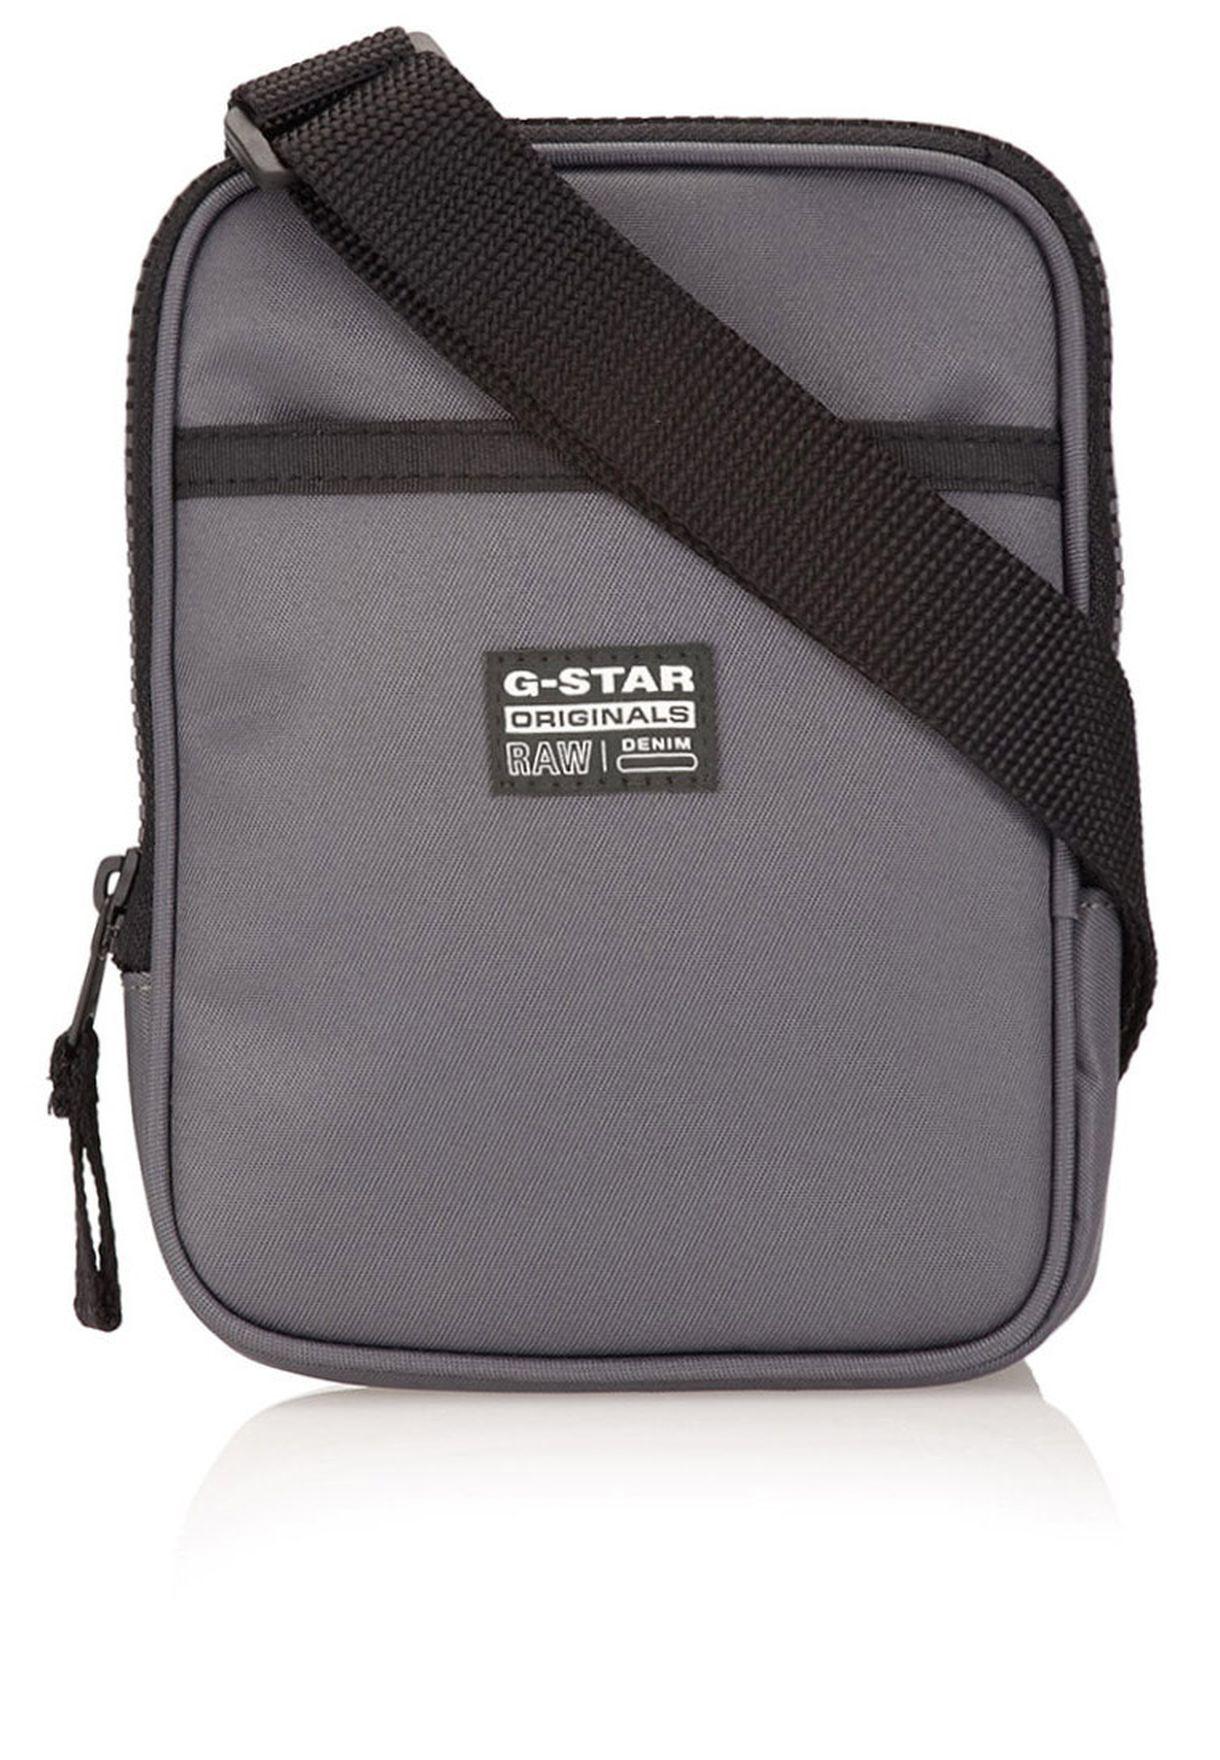 15ce8e5355cfa تسوق حقيبة رجالية بحمالة طويلة ماركة جي ستار رو لون رمادي في قطر ...